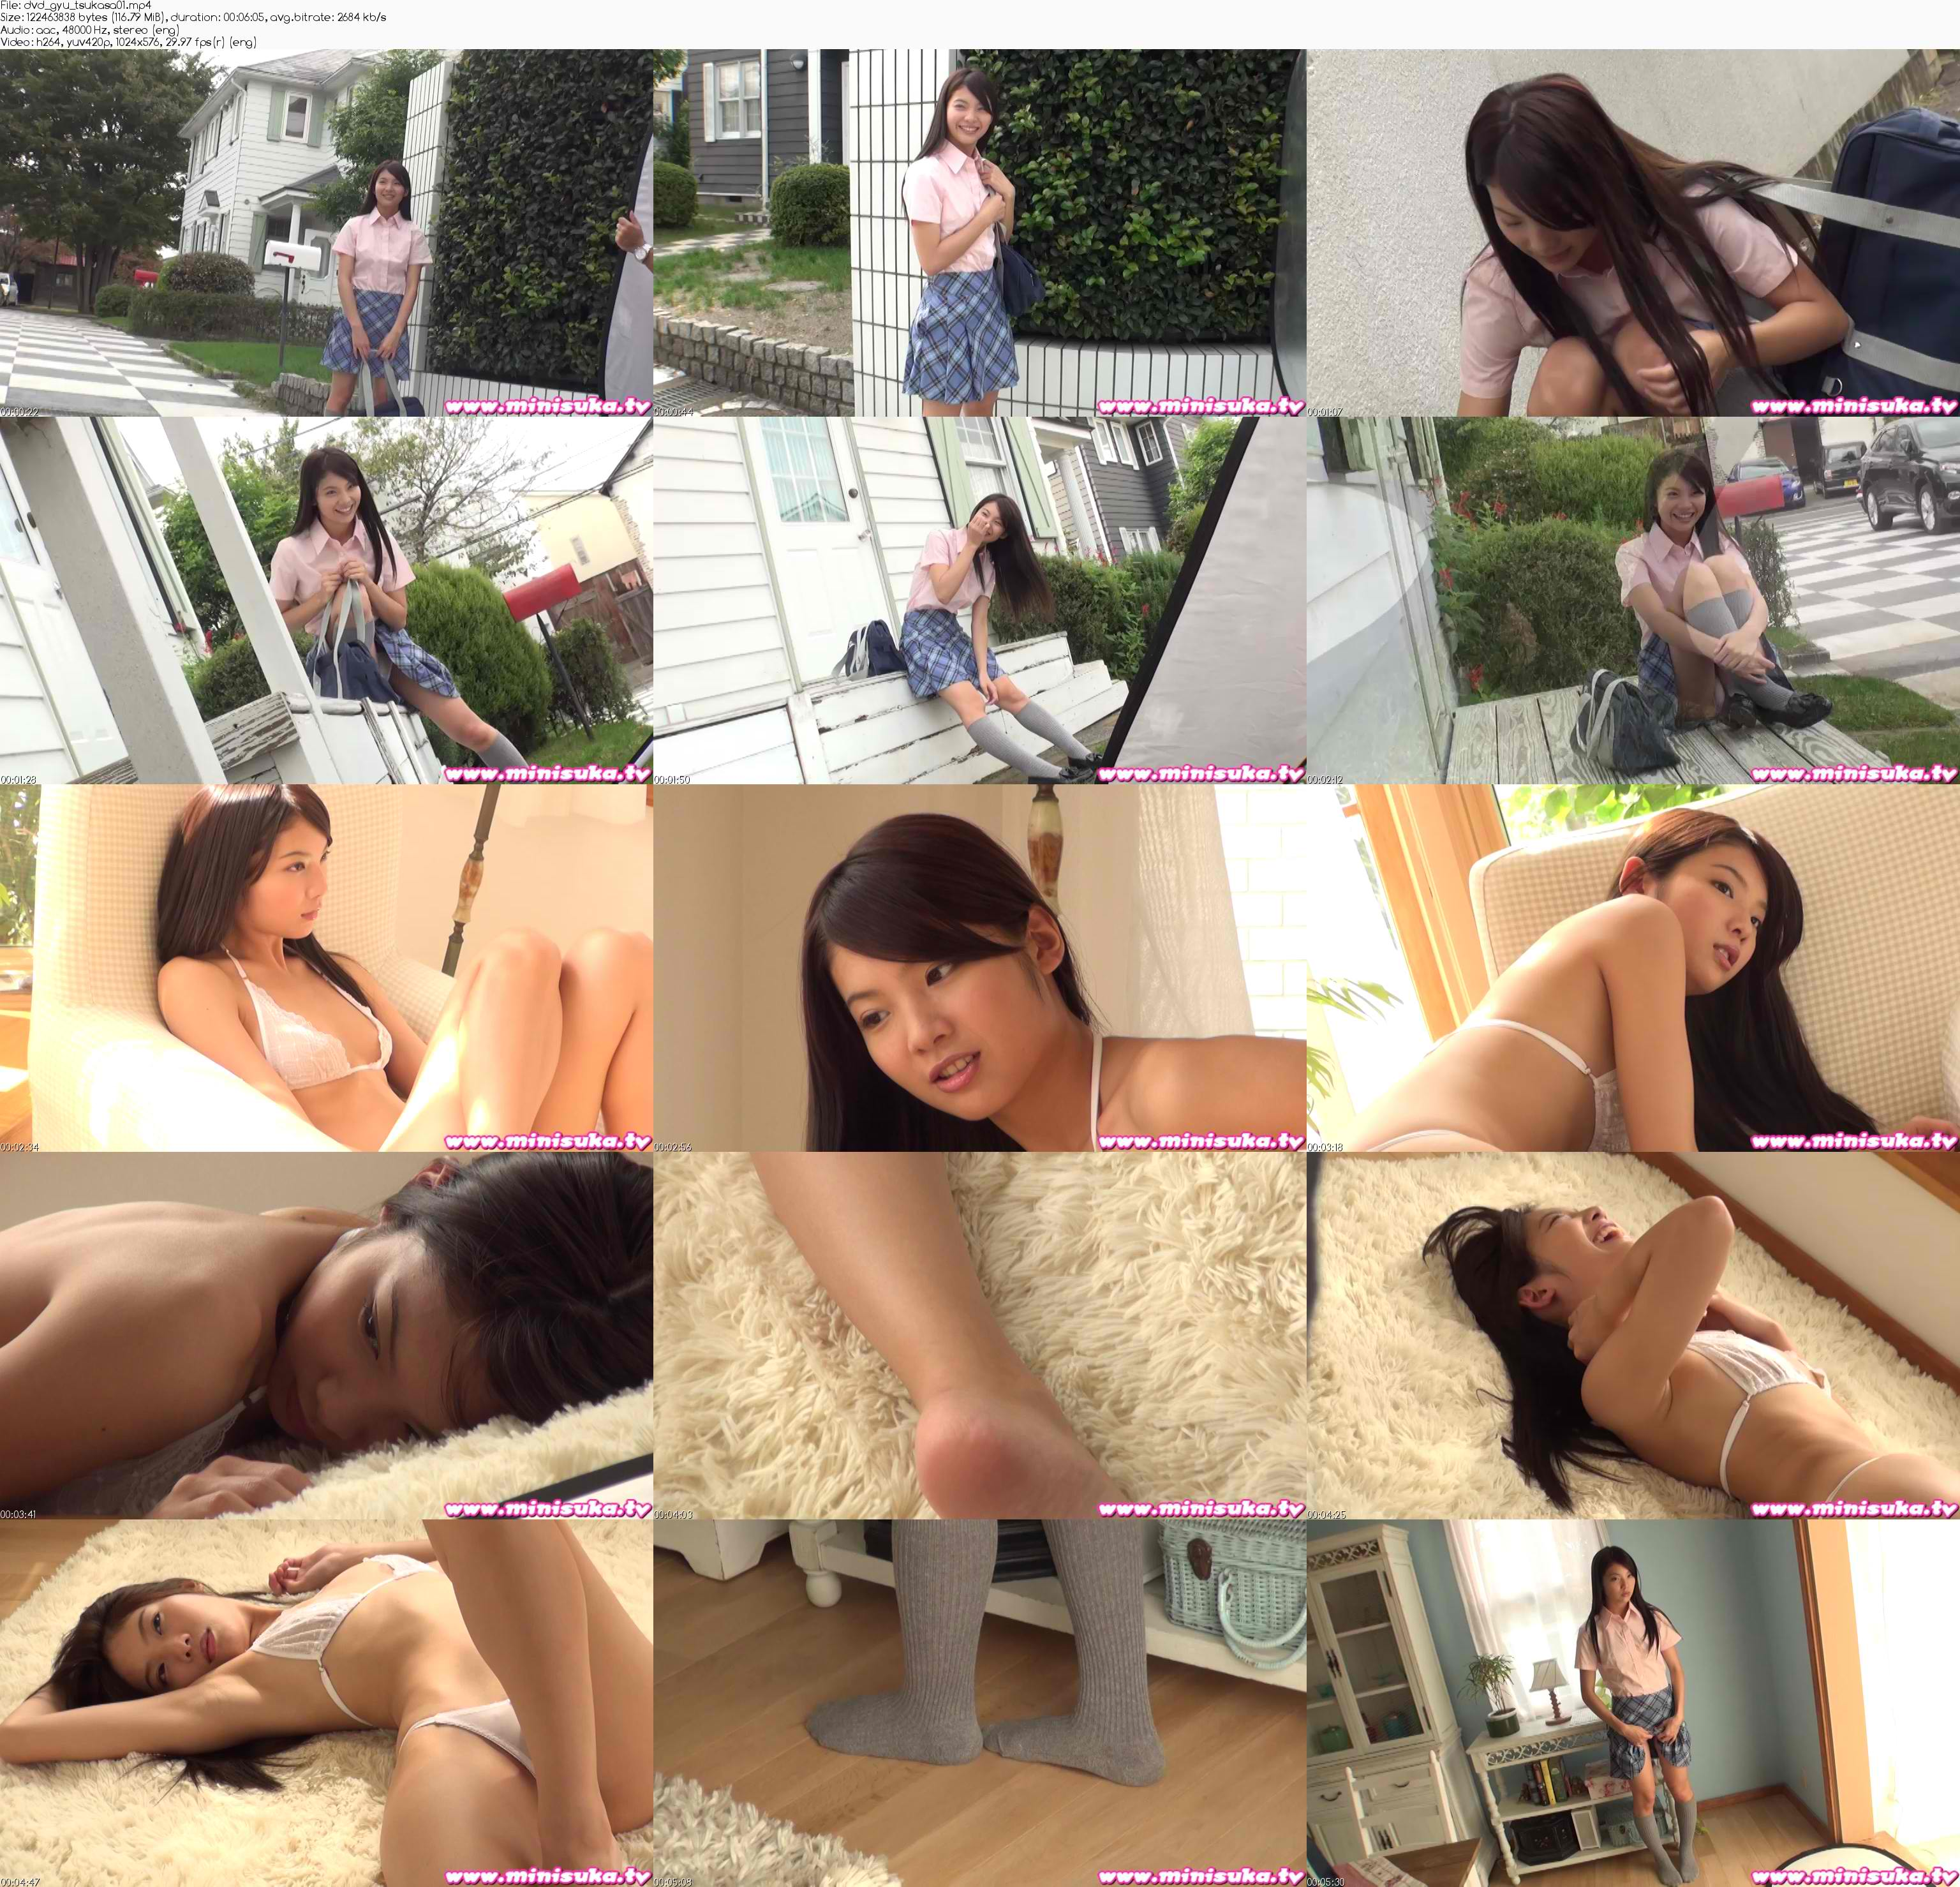 minisuka tv Kanzaki [Minisuka.tv] 2014-11-27 Tsukasa Kanzaki - Limited Gallery MOVIE 01 [116.8MB]